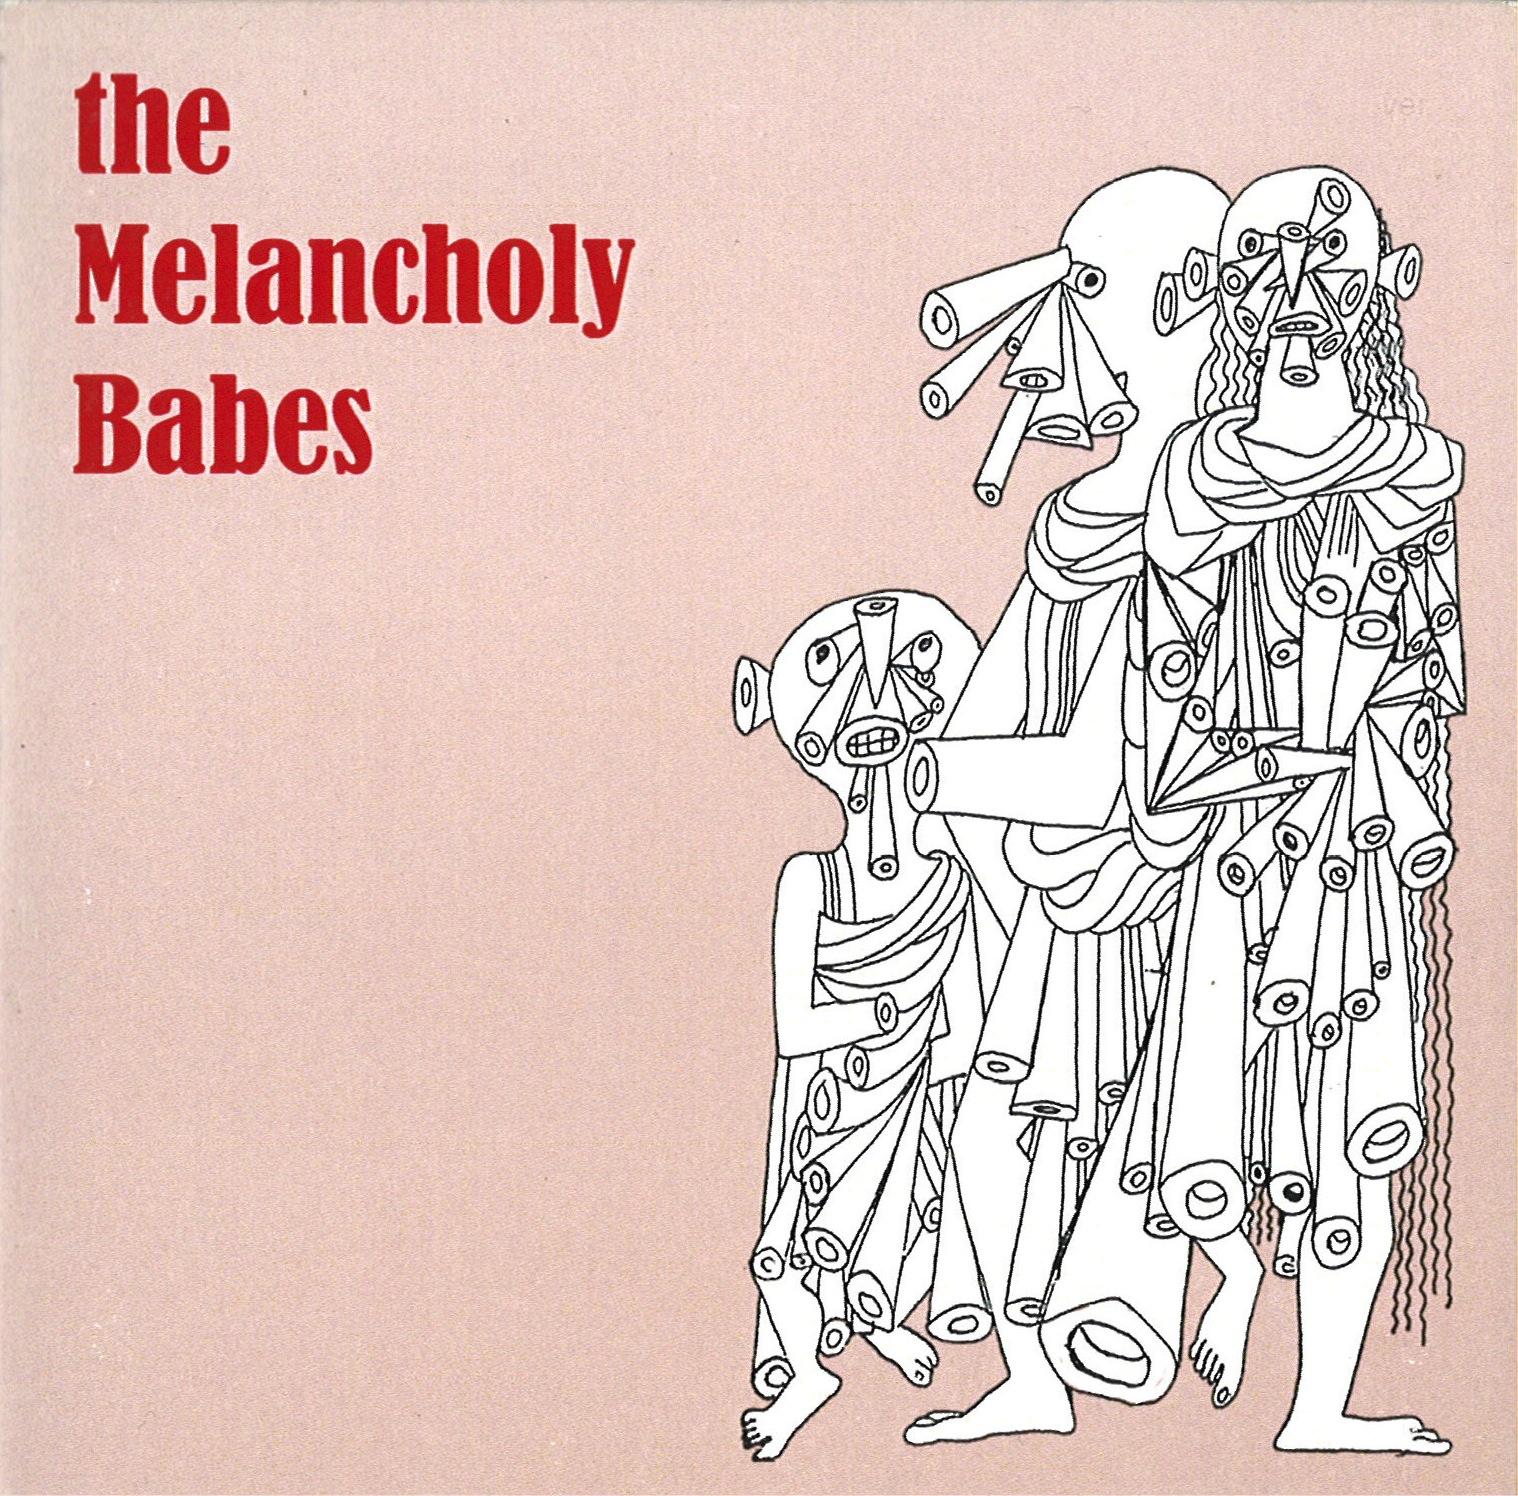 Henderson, Callwood, Donaldson: The Melancholy Babes - CD